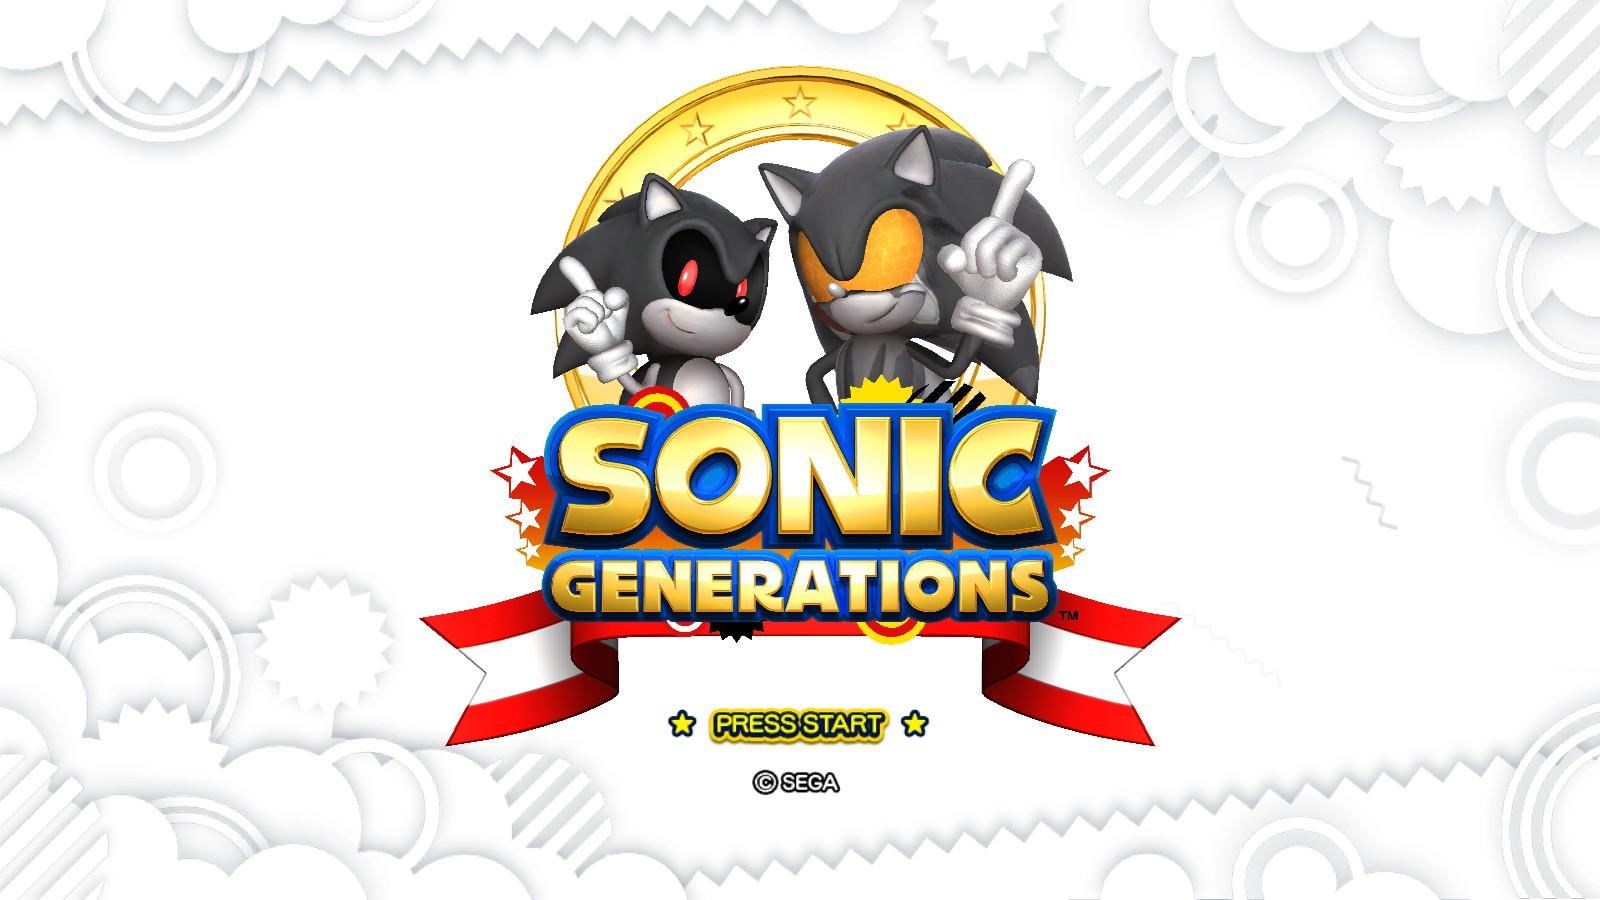 Silver Sonic Mod Base Image Mod Db